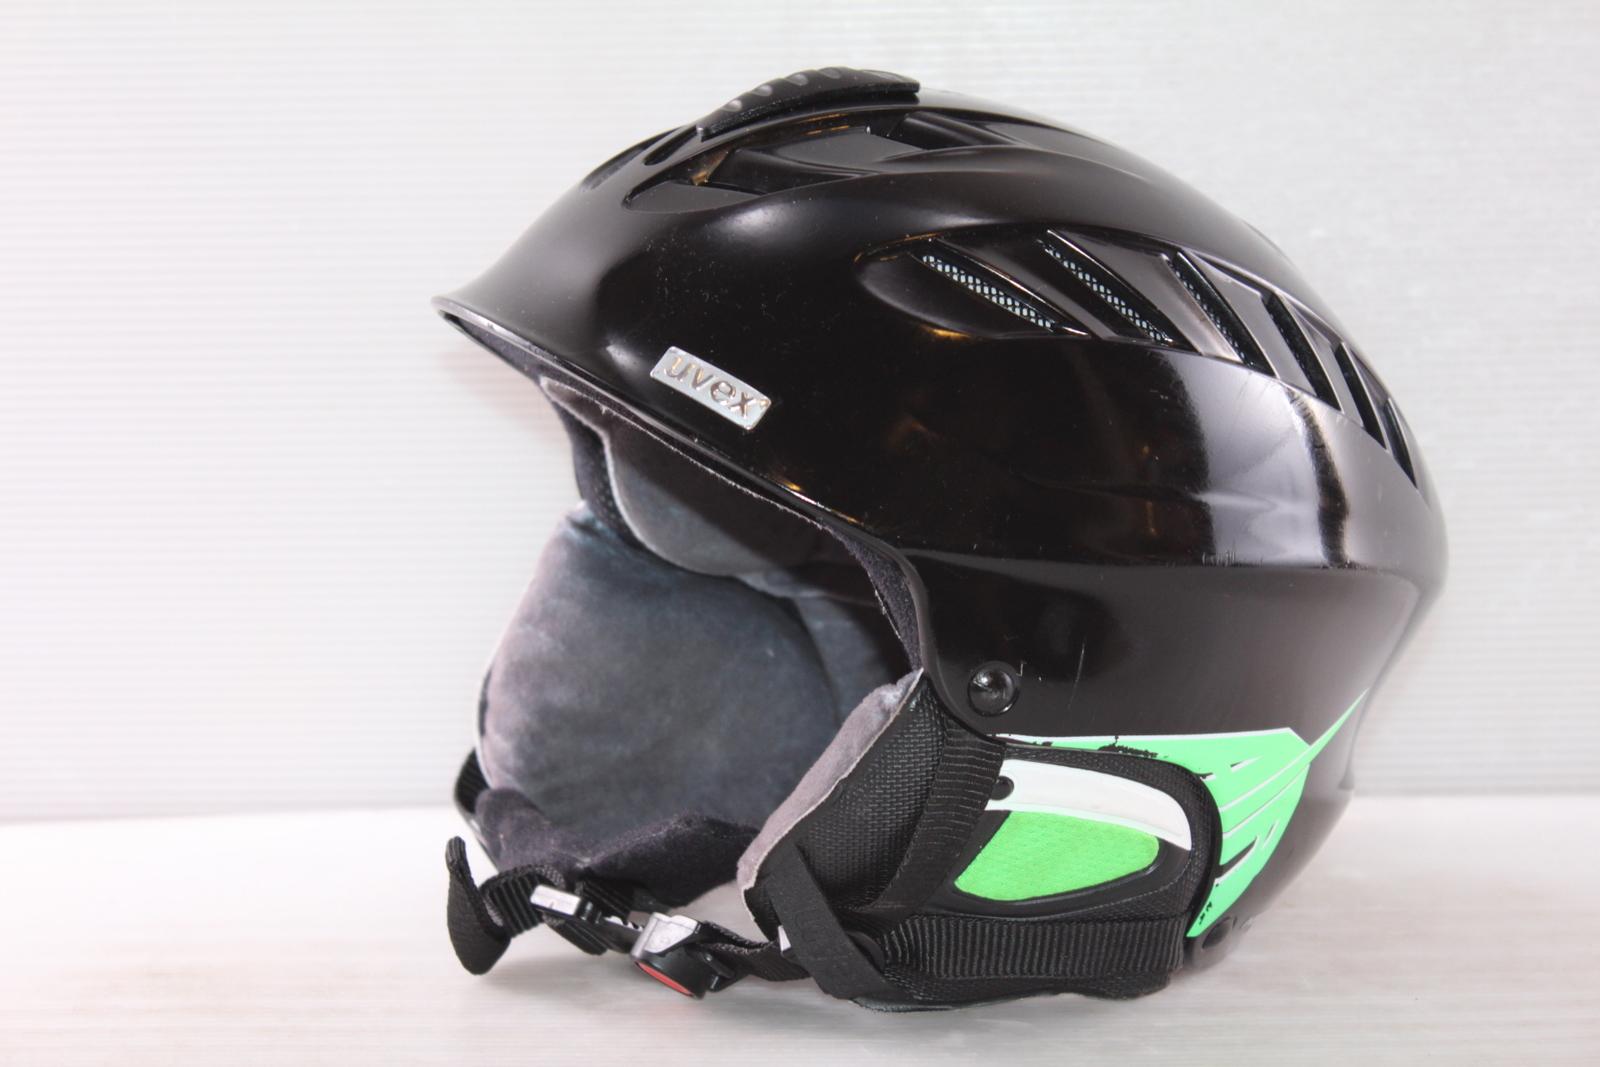 Dětská lyžařská helma Uvex Uvex - posuvná vel. 53 - 57